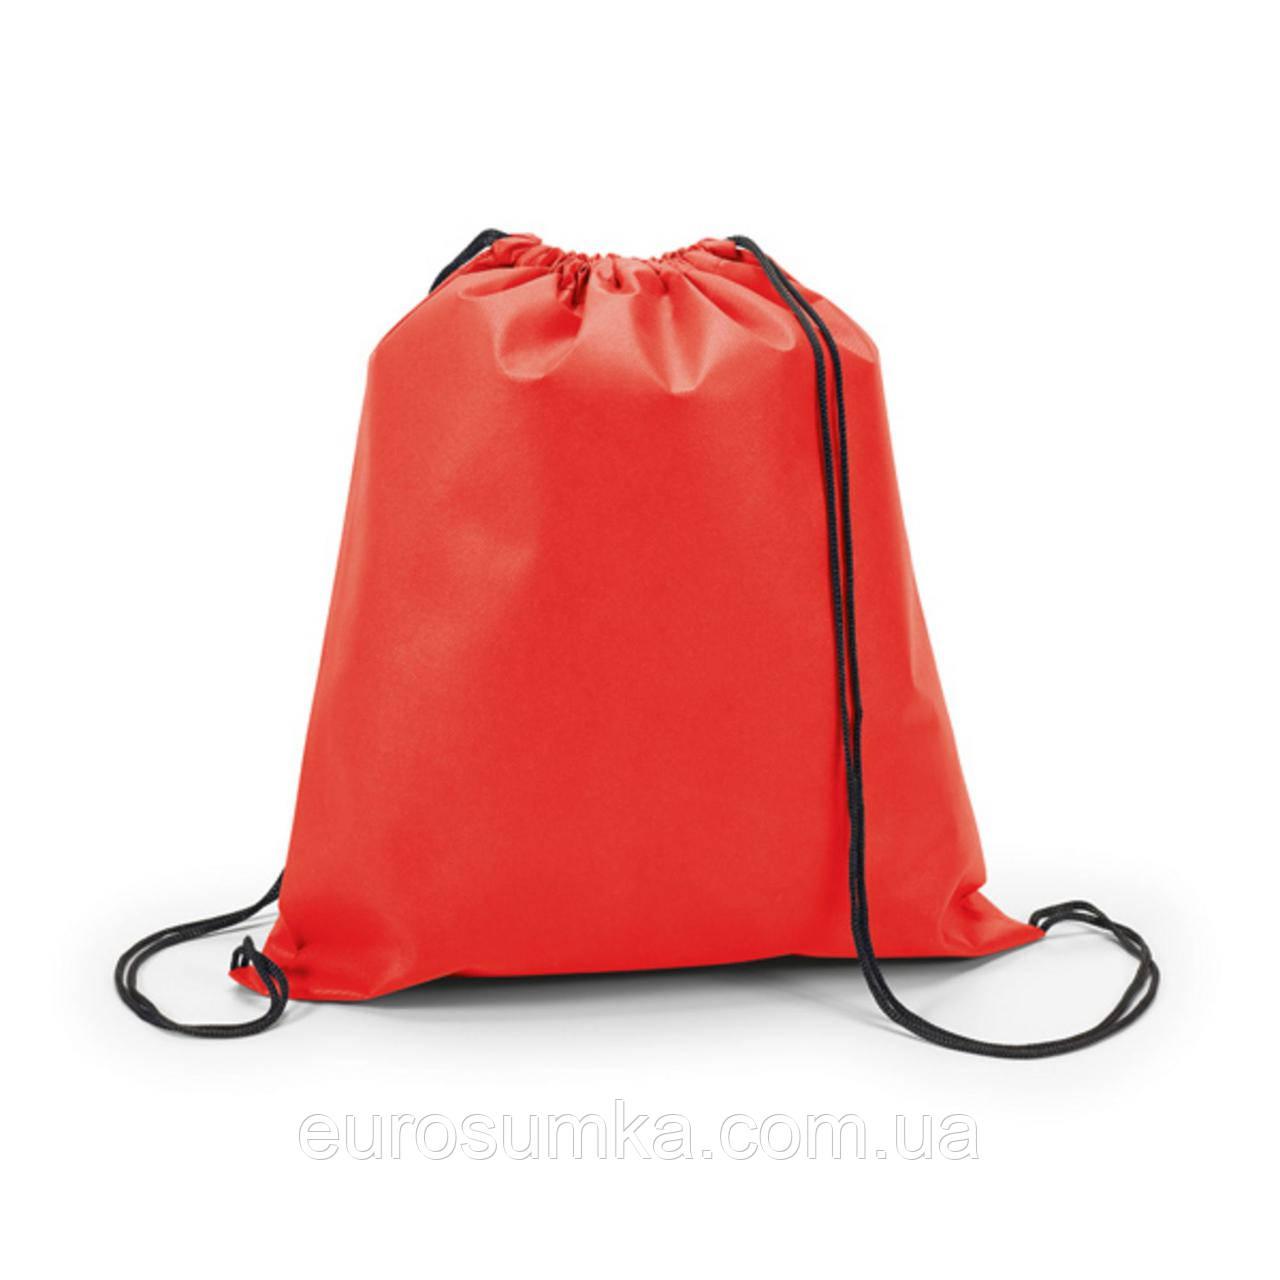 Рюкзак со шнурками от 100 шт.